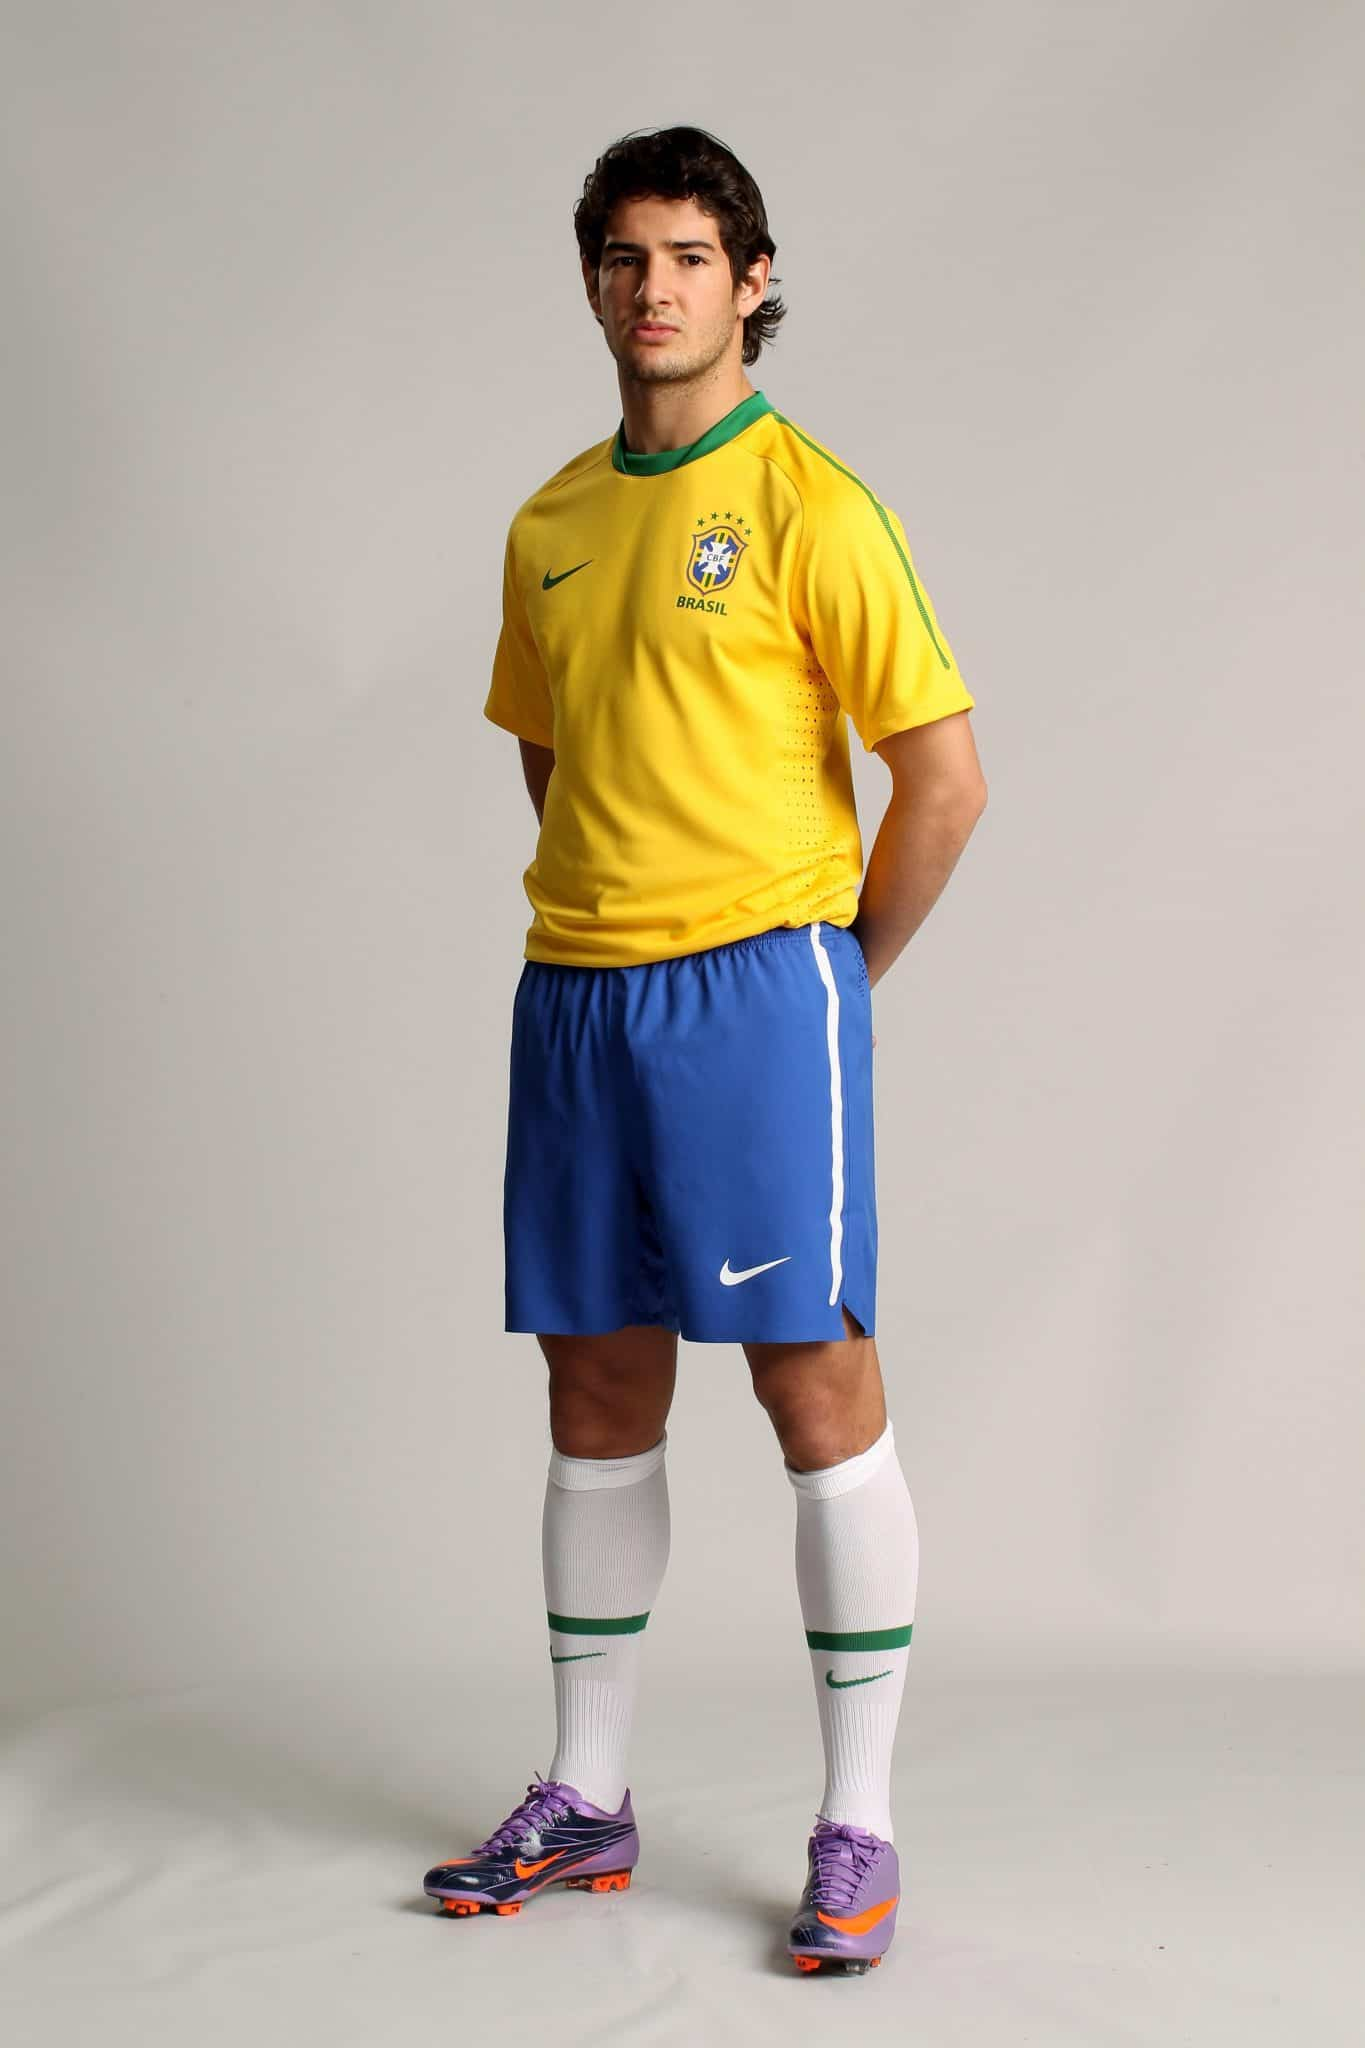 Nike's Plastic Football Kits